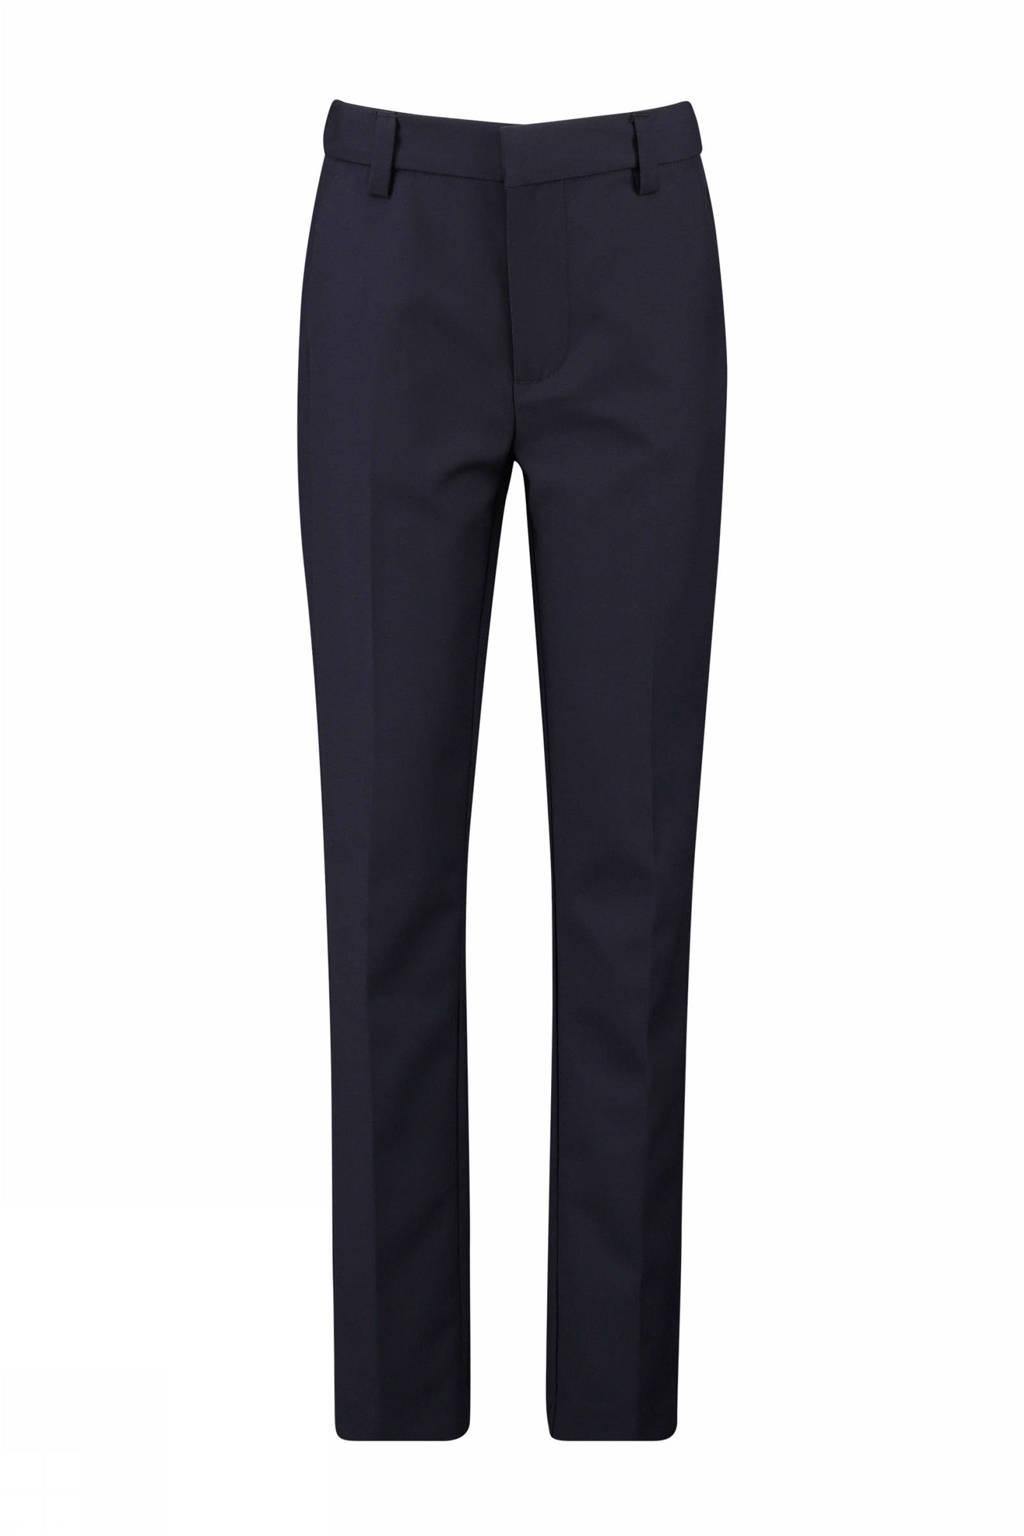 CKS KIDS straight fit pantalon Burling blauw, Donkerblauw